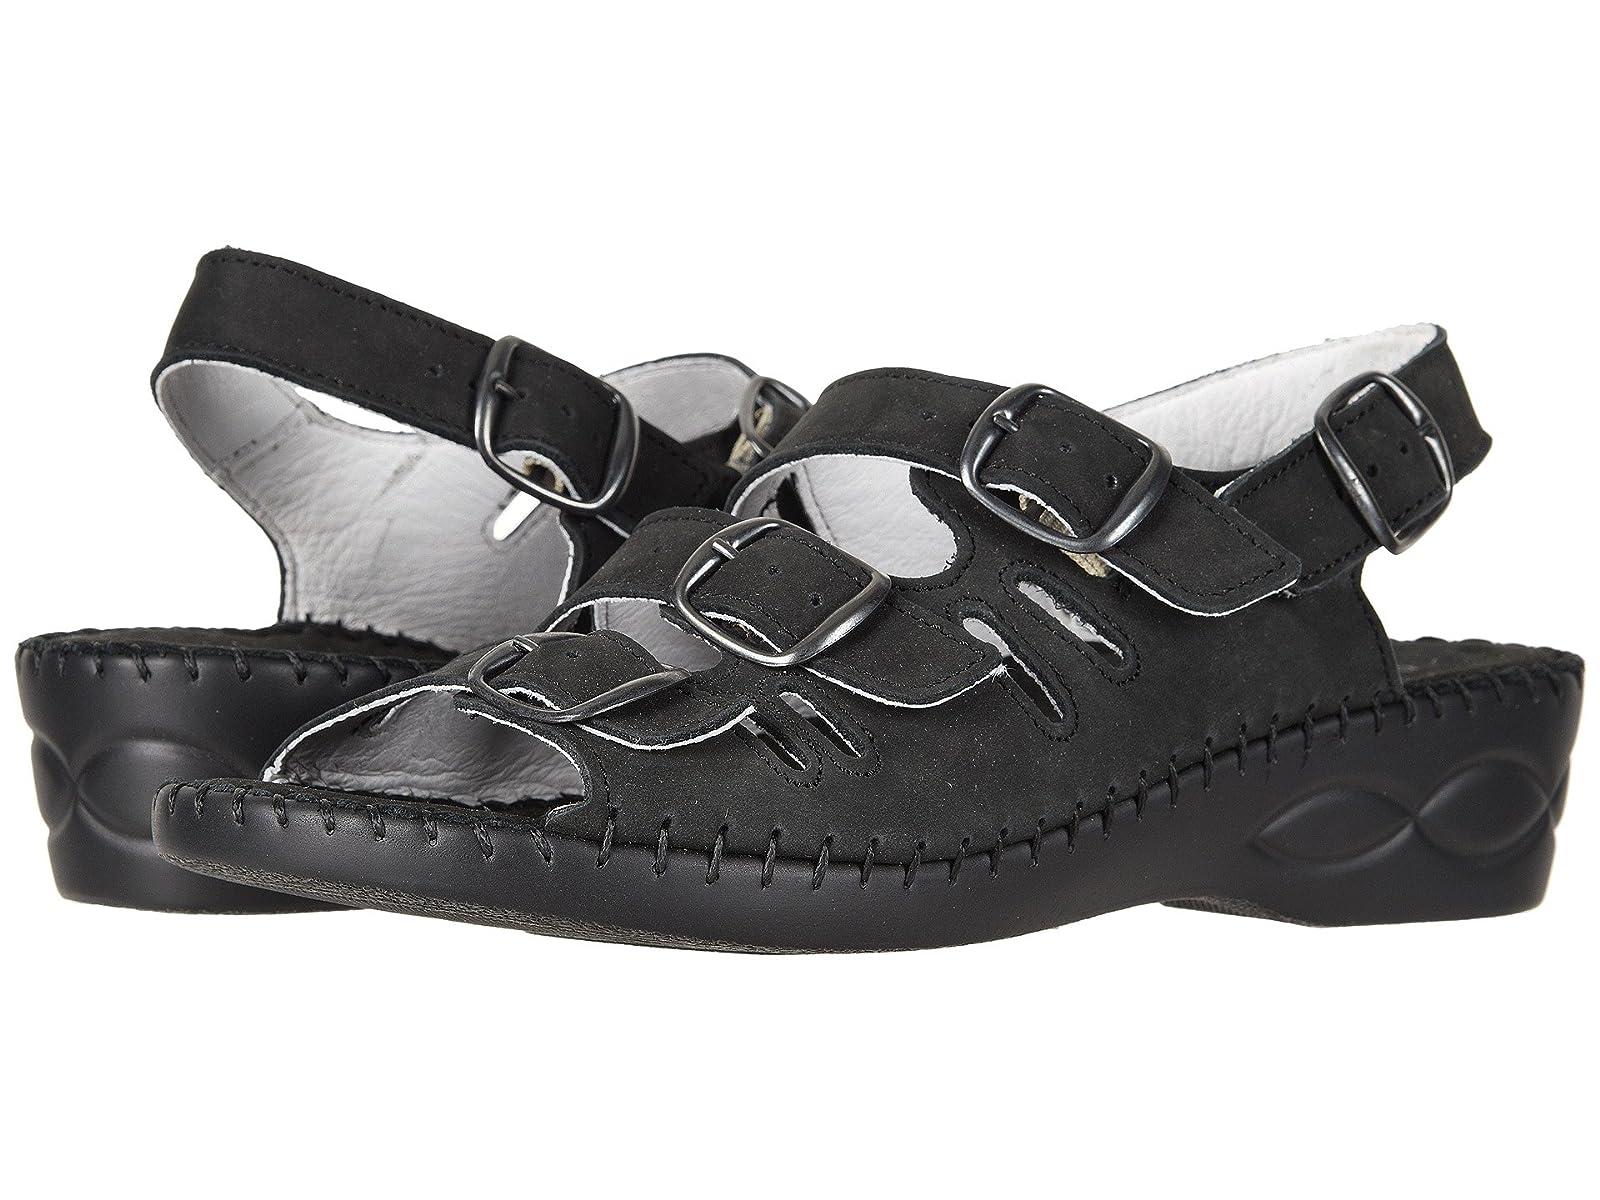 David Tate LunaAtmospheric grades have affordable shoes